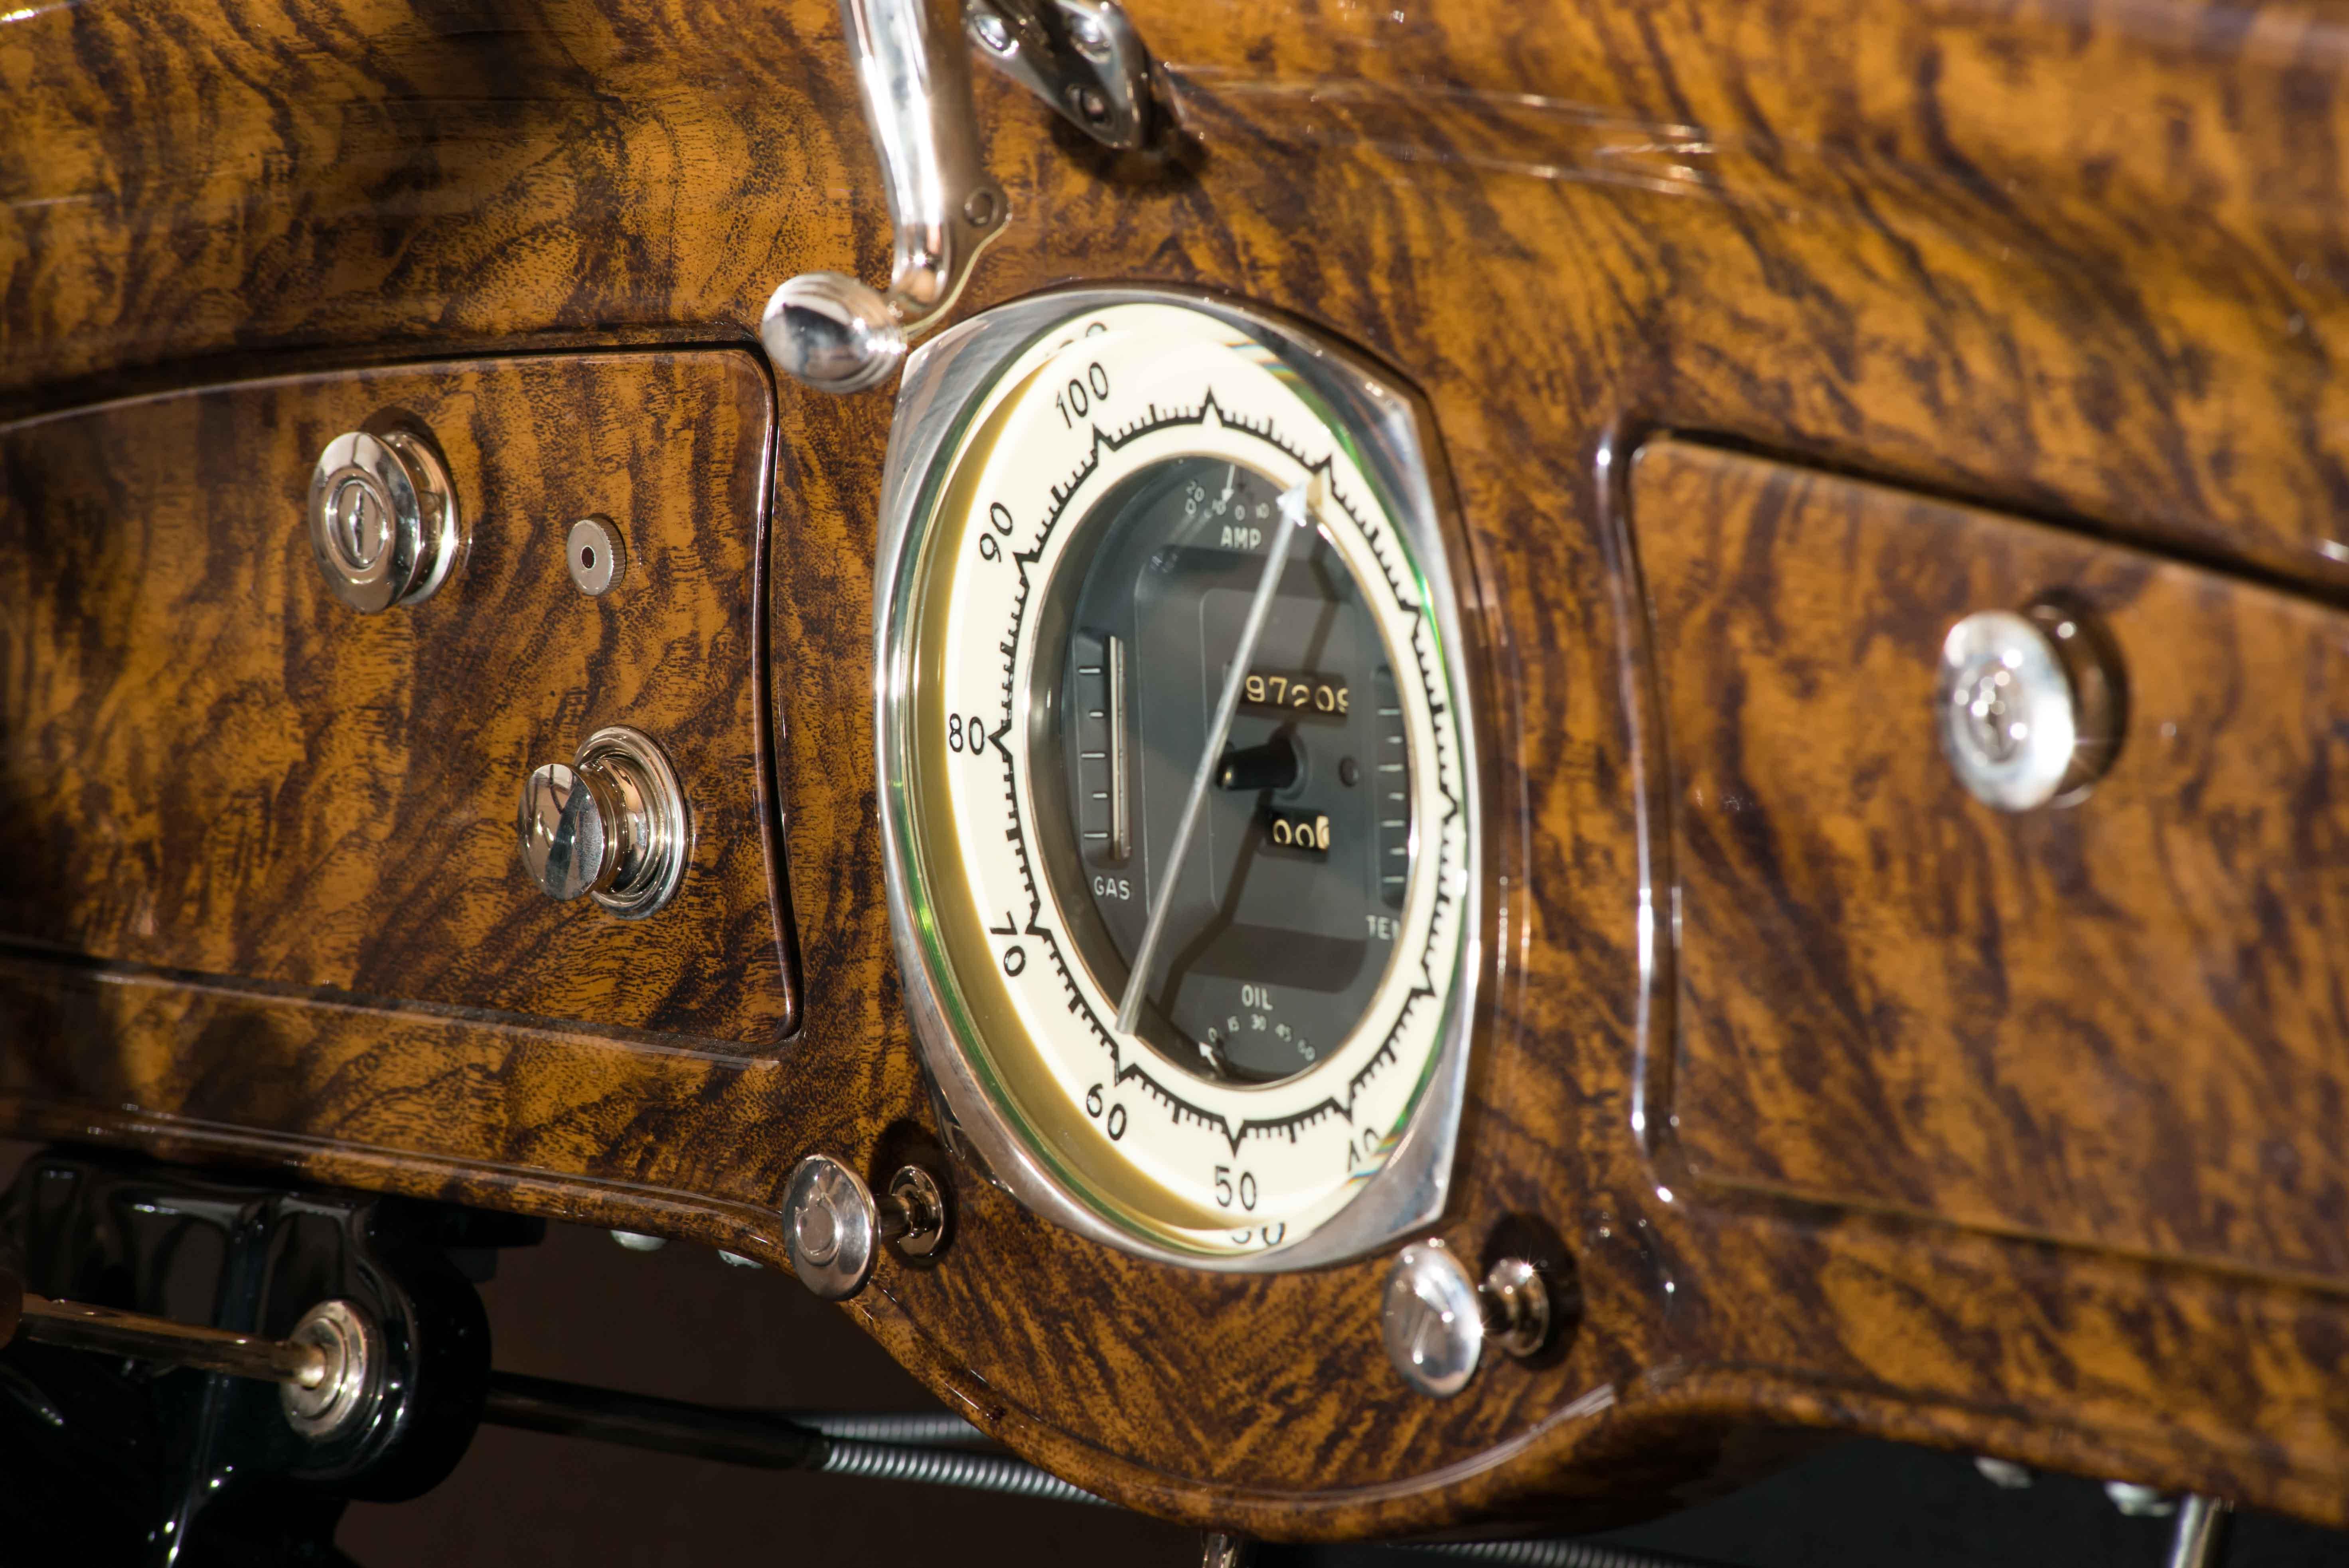 1932 Graham Blue Streak speedometer